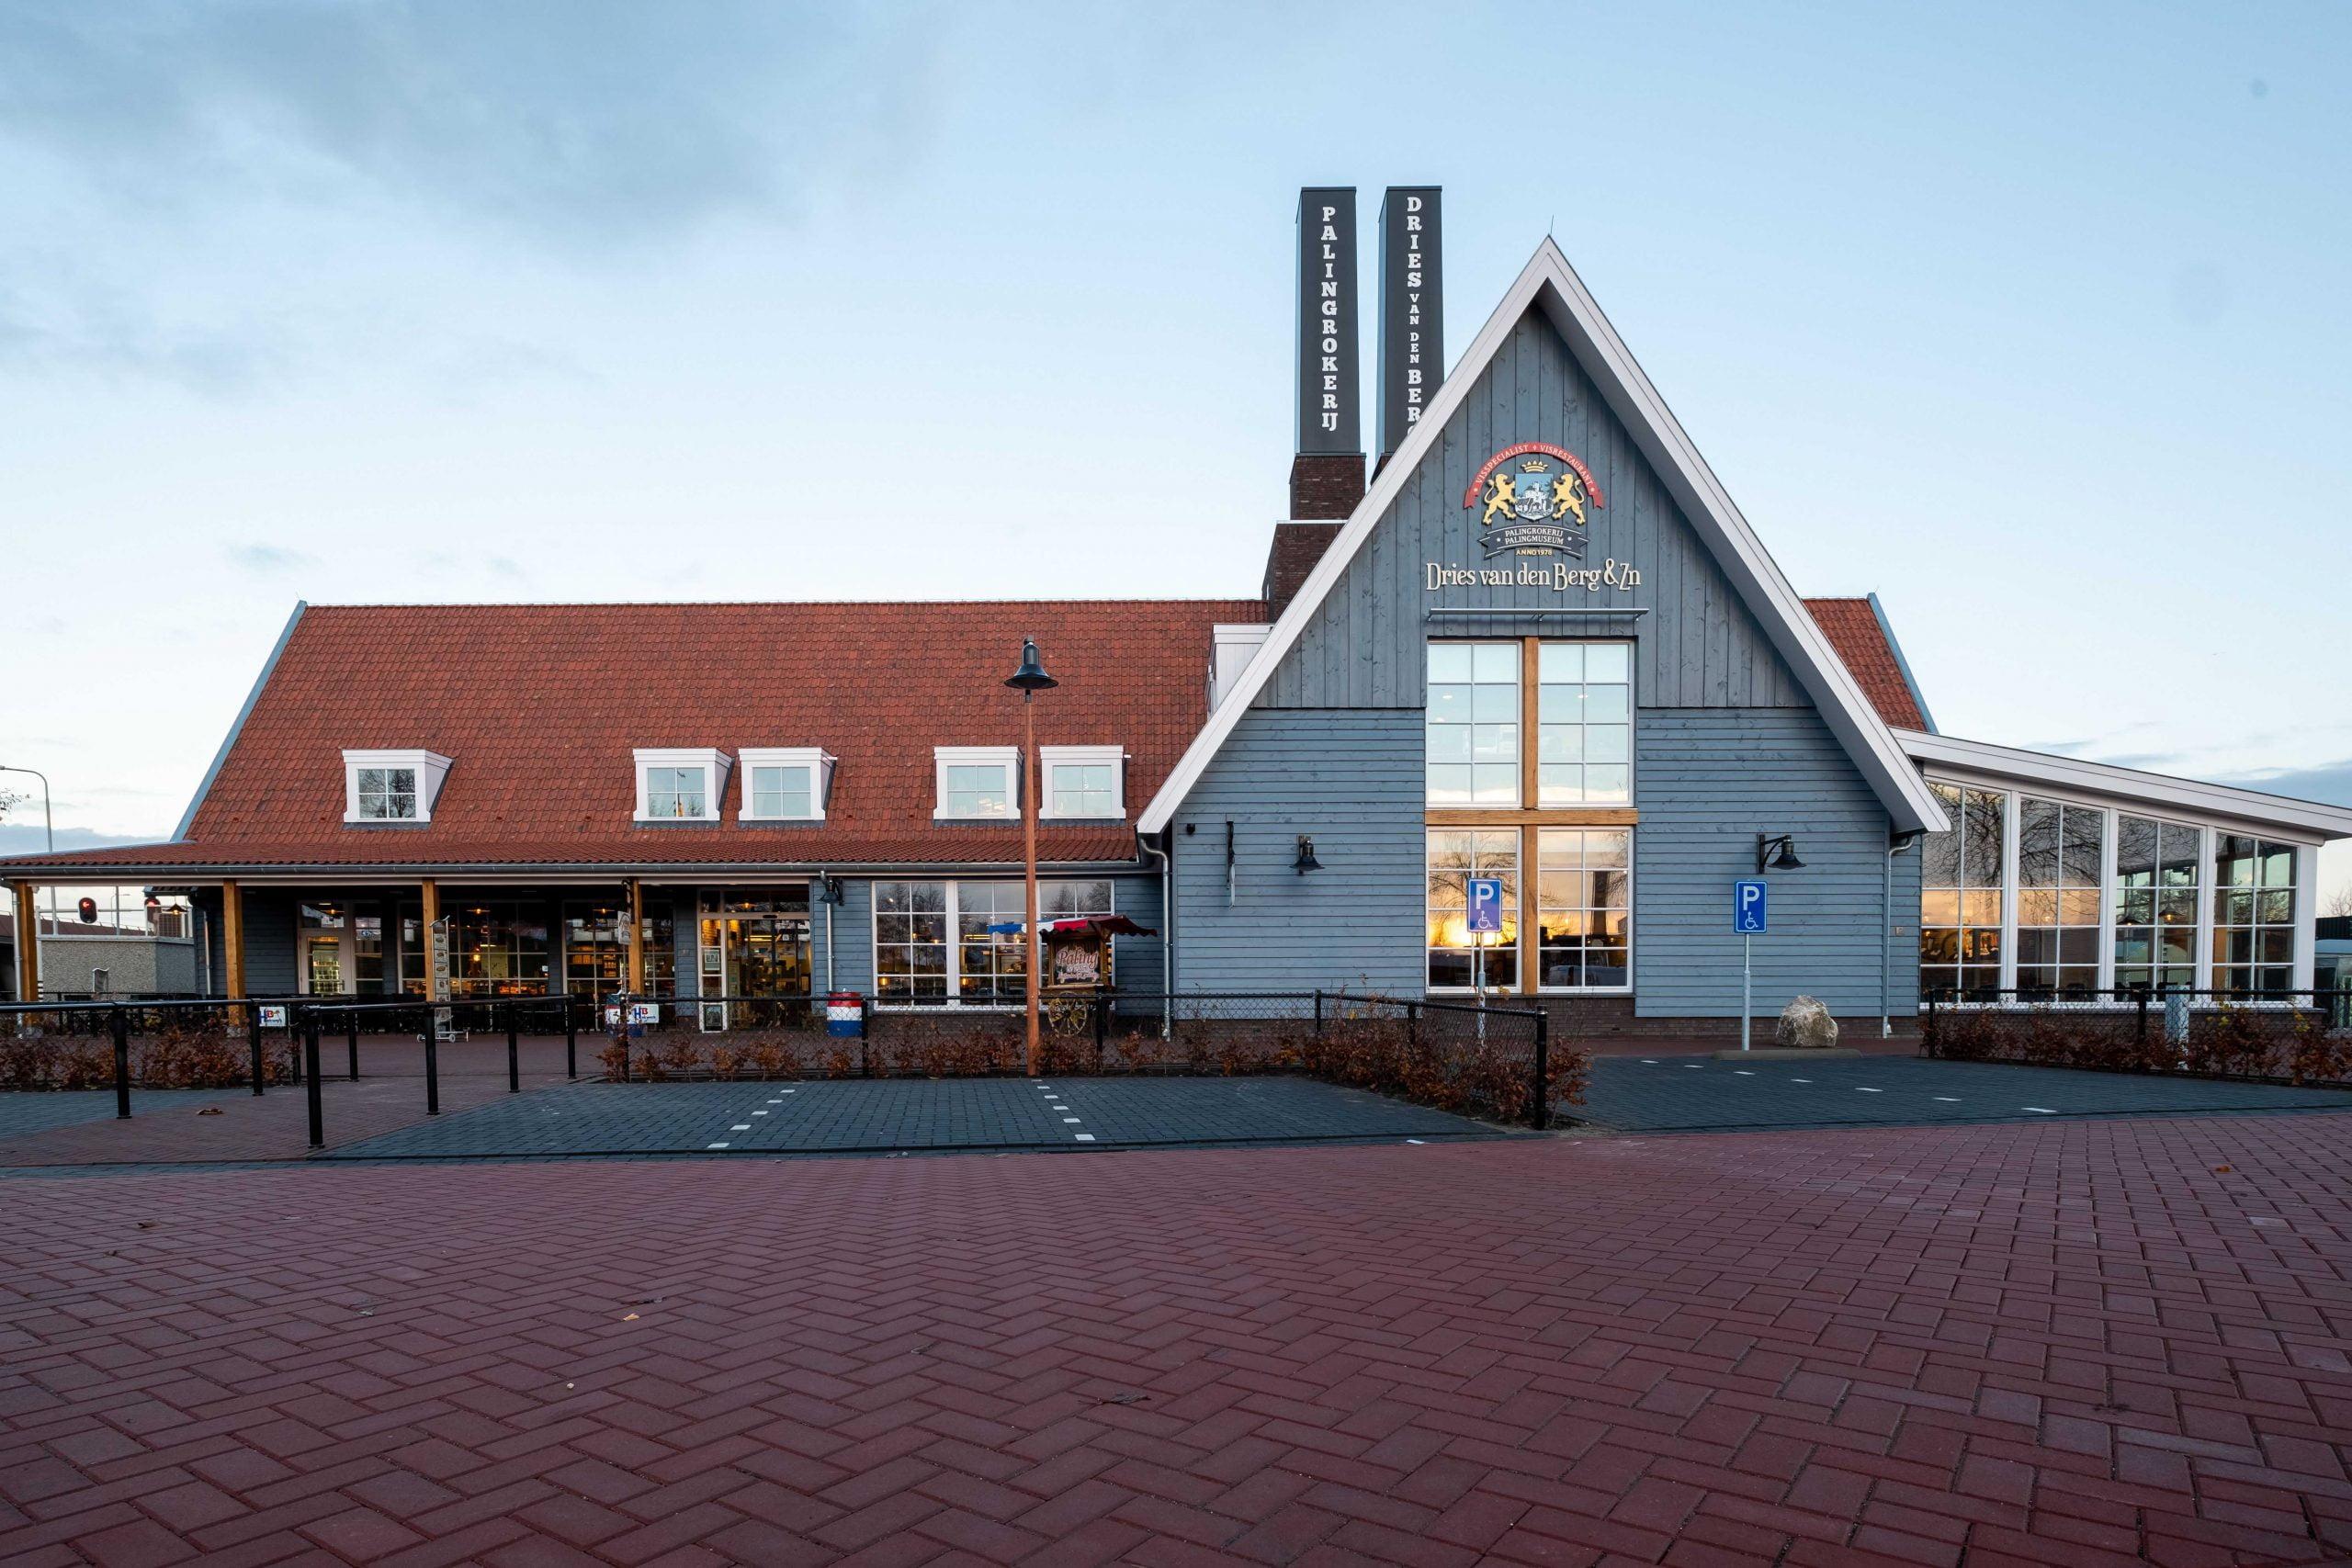 Bedrijfsfotograaf in Haaksbergen